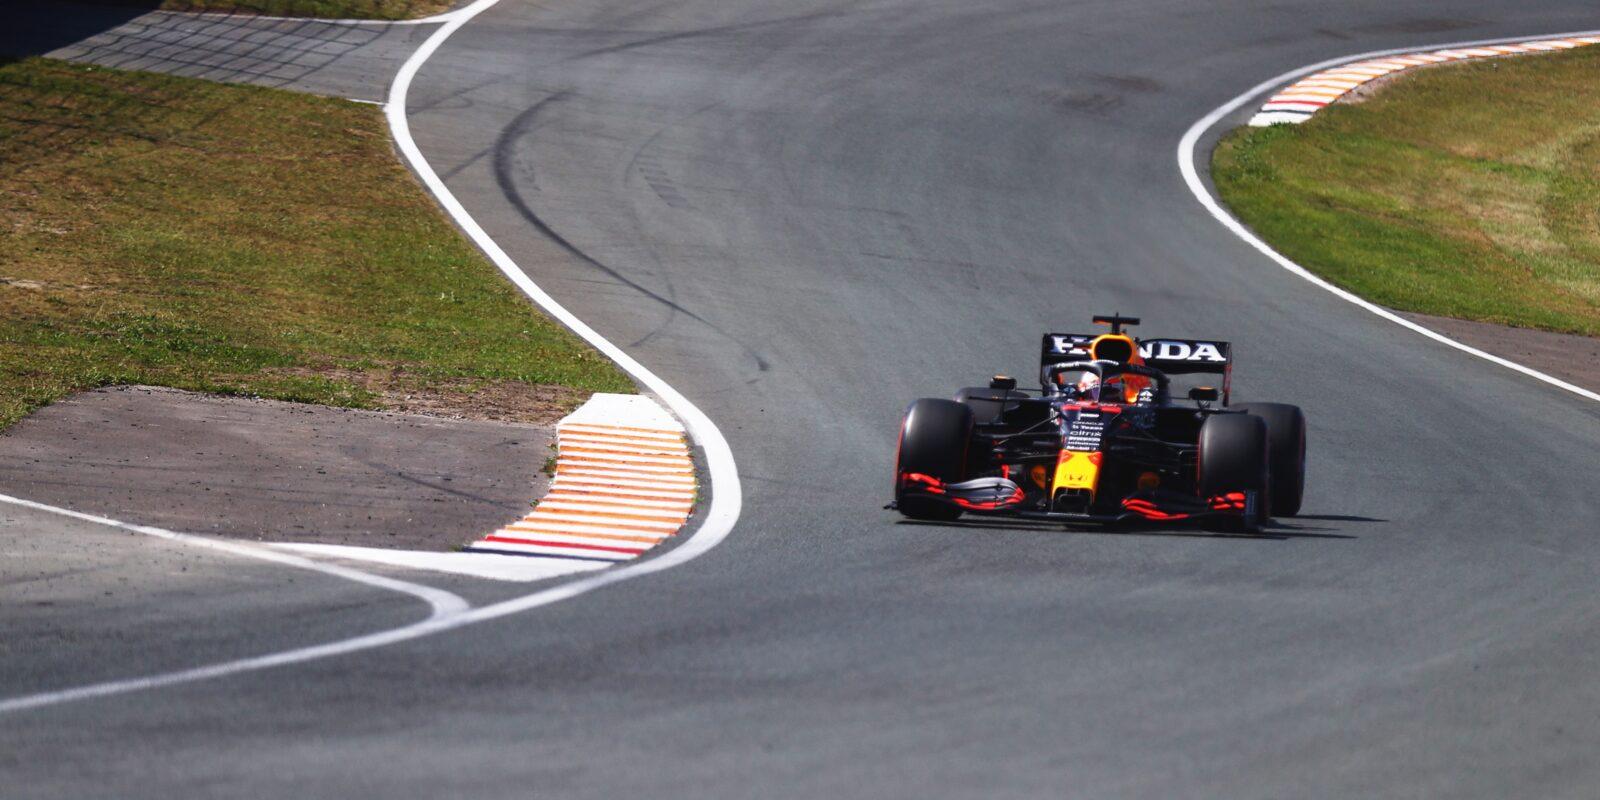 Kvalifikaci na Zandvoortu si podmanil Max Verstappen